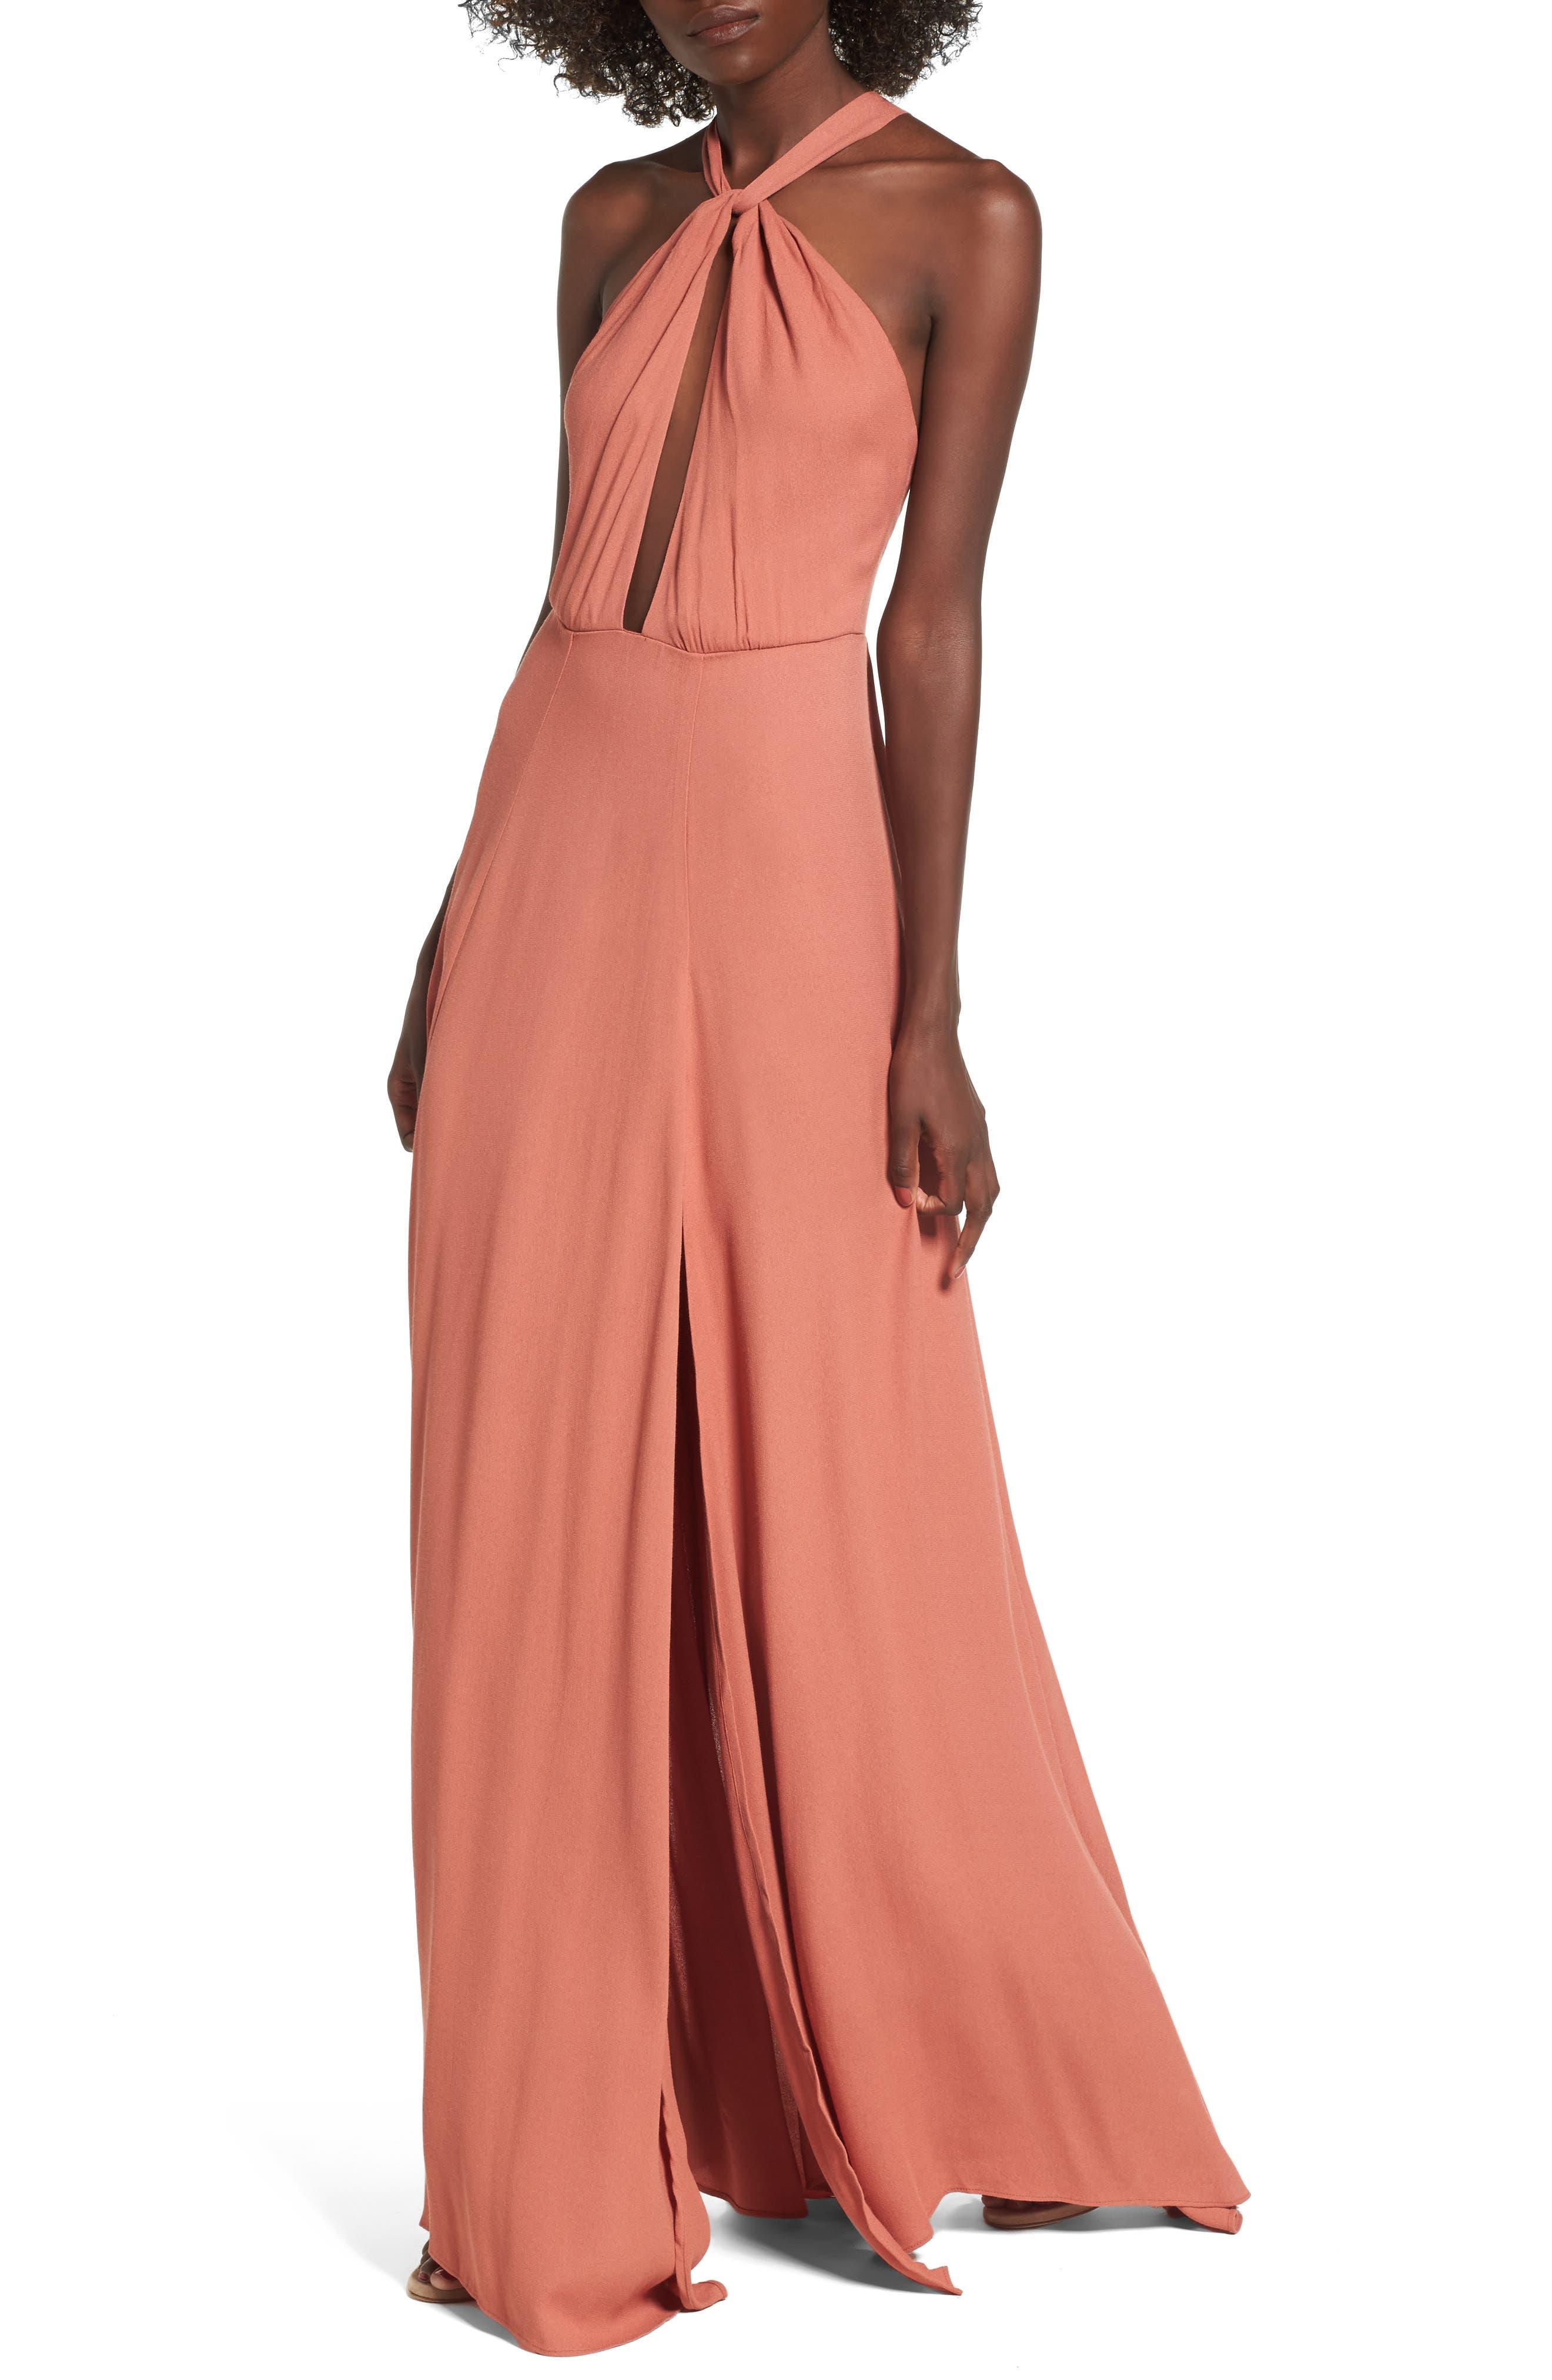 Main Image - AFRM Harlean Halter Maxi Dress